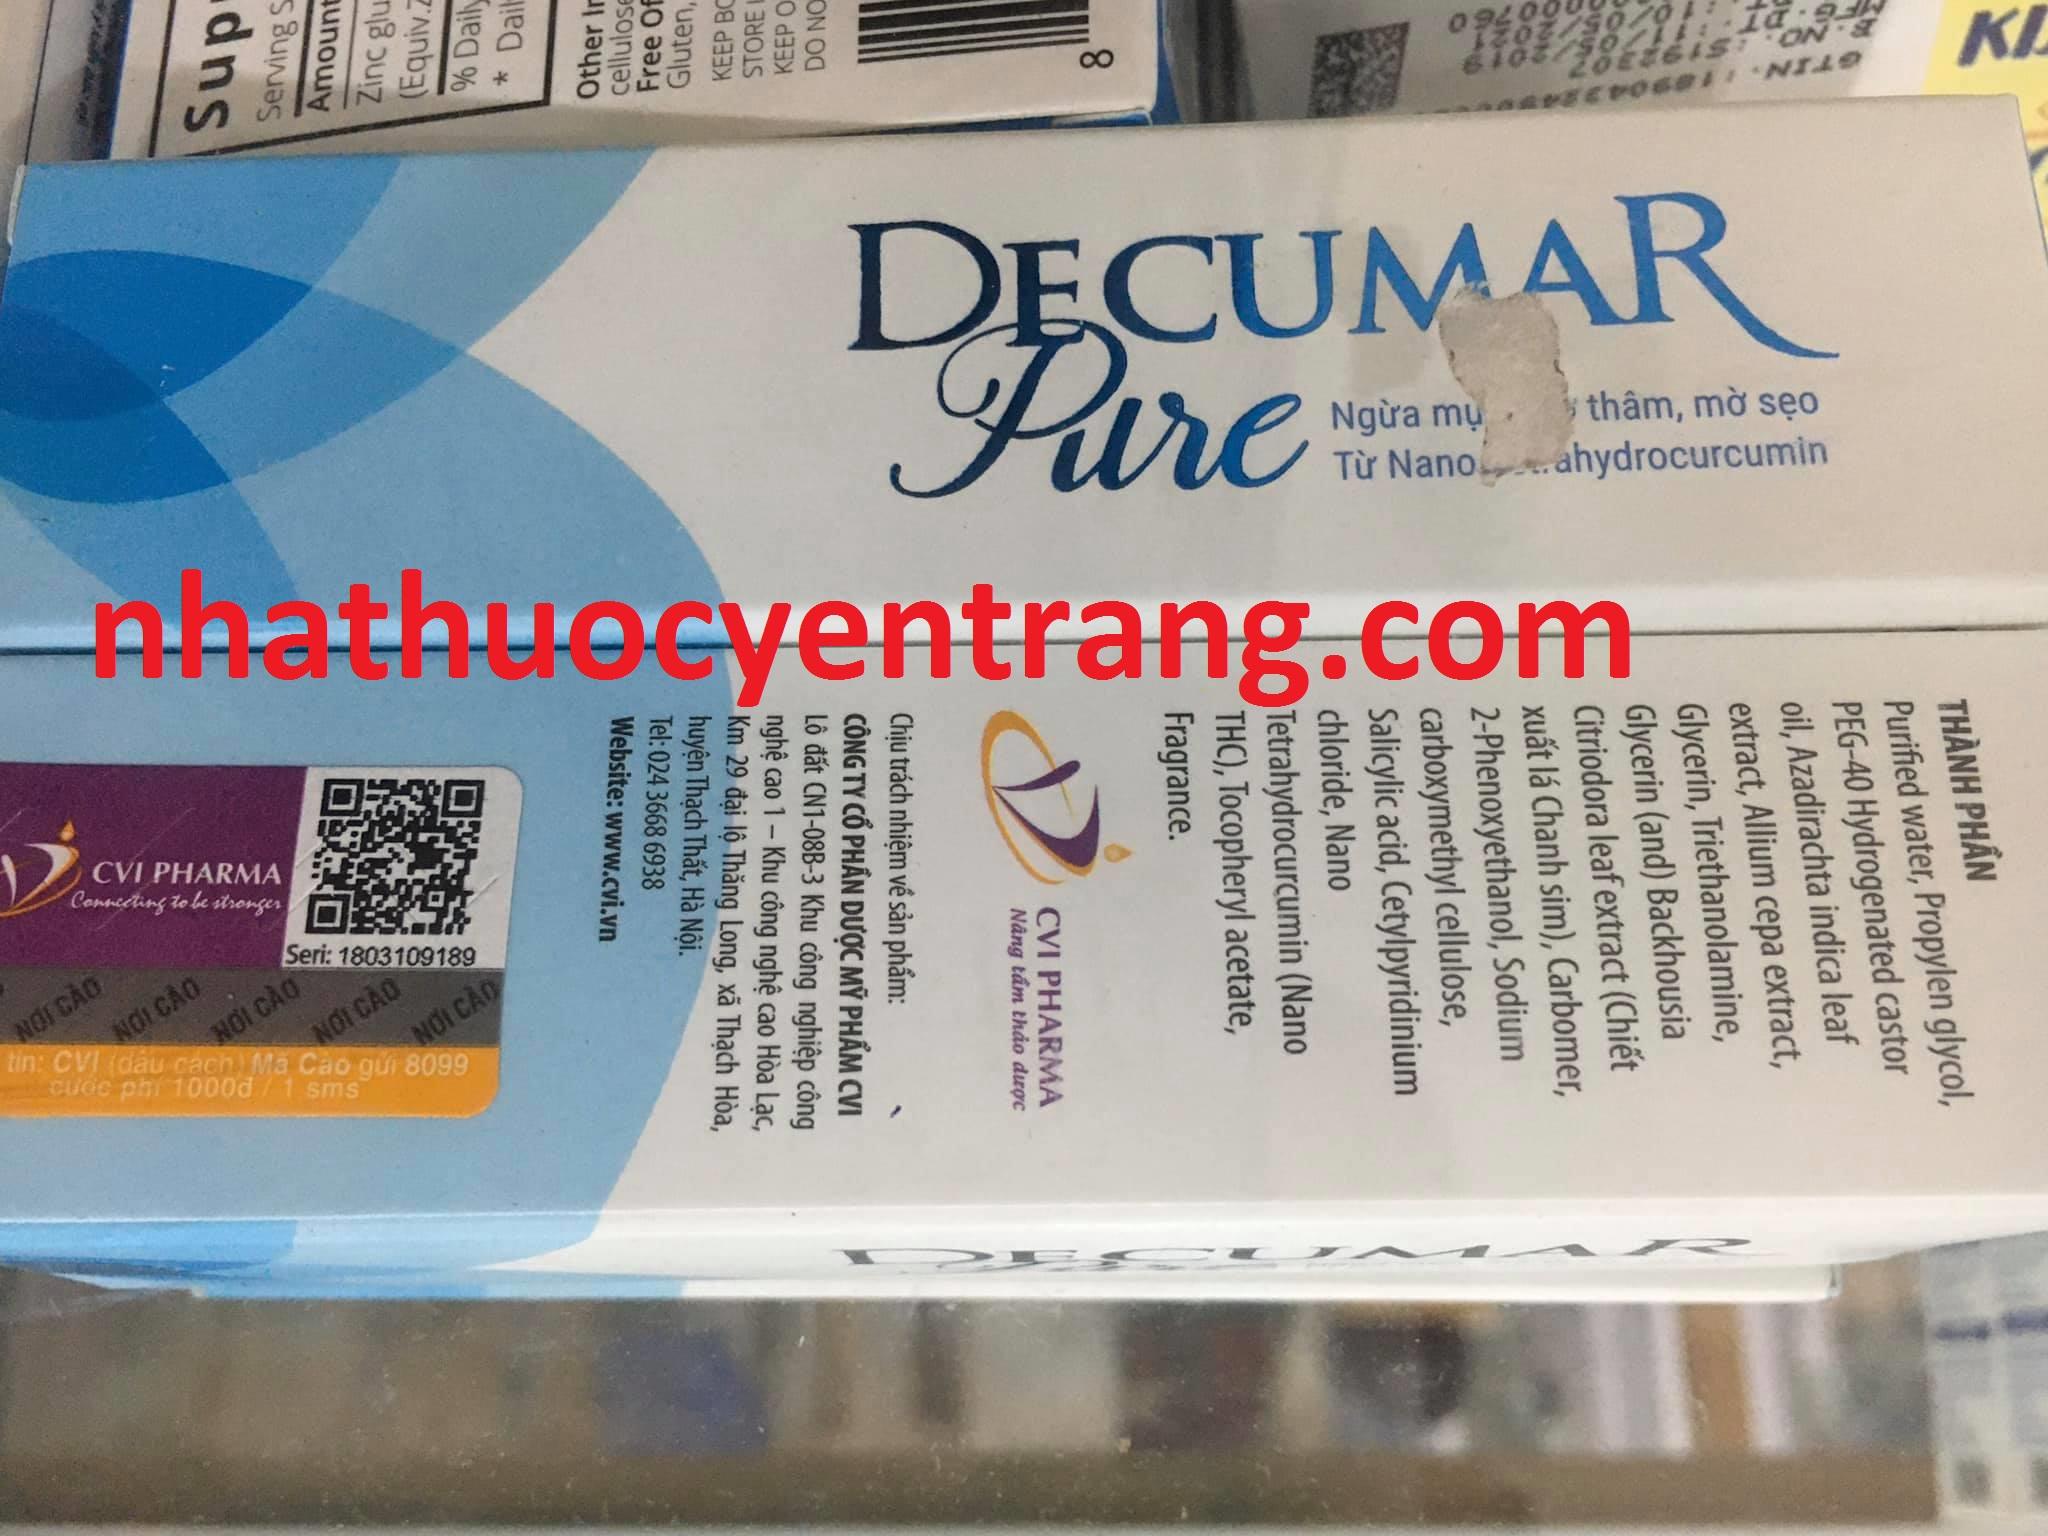 Decumar Pure 15g